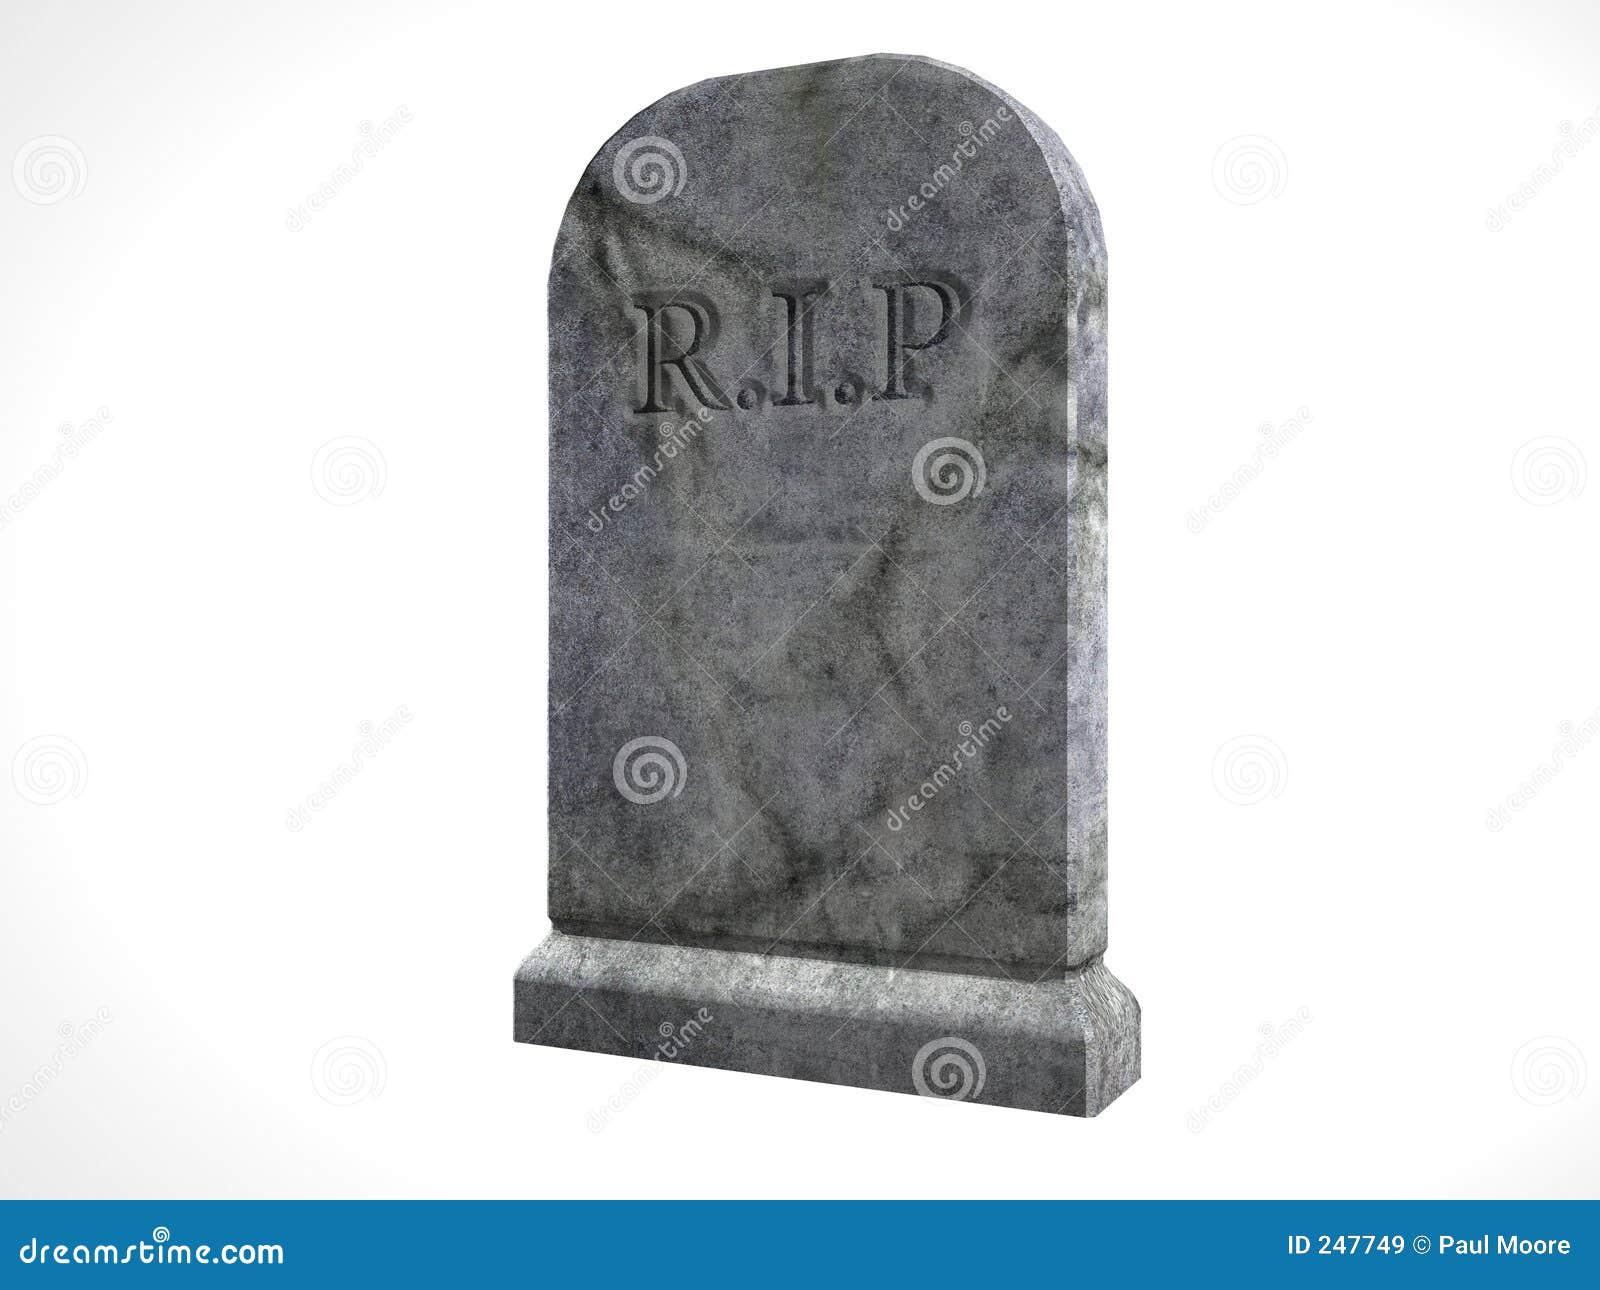 Надгробная плита фото памятники на могилу челябинск цены в салехарде